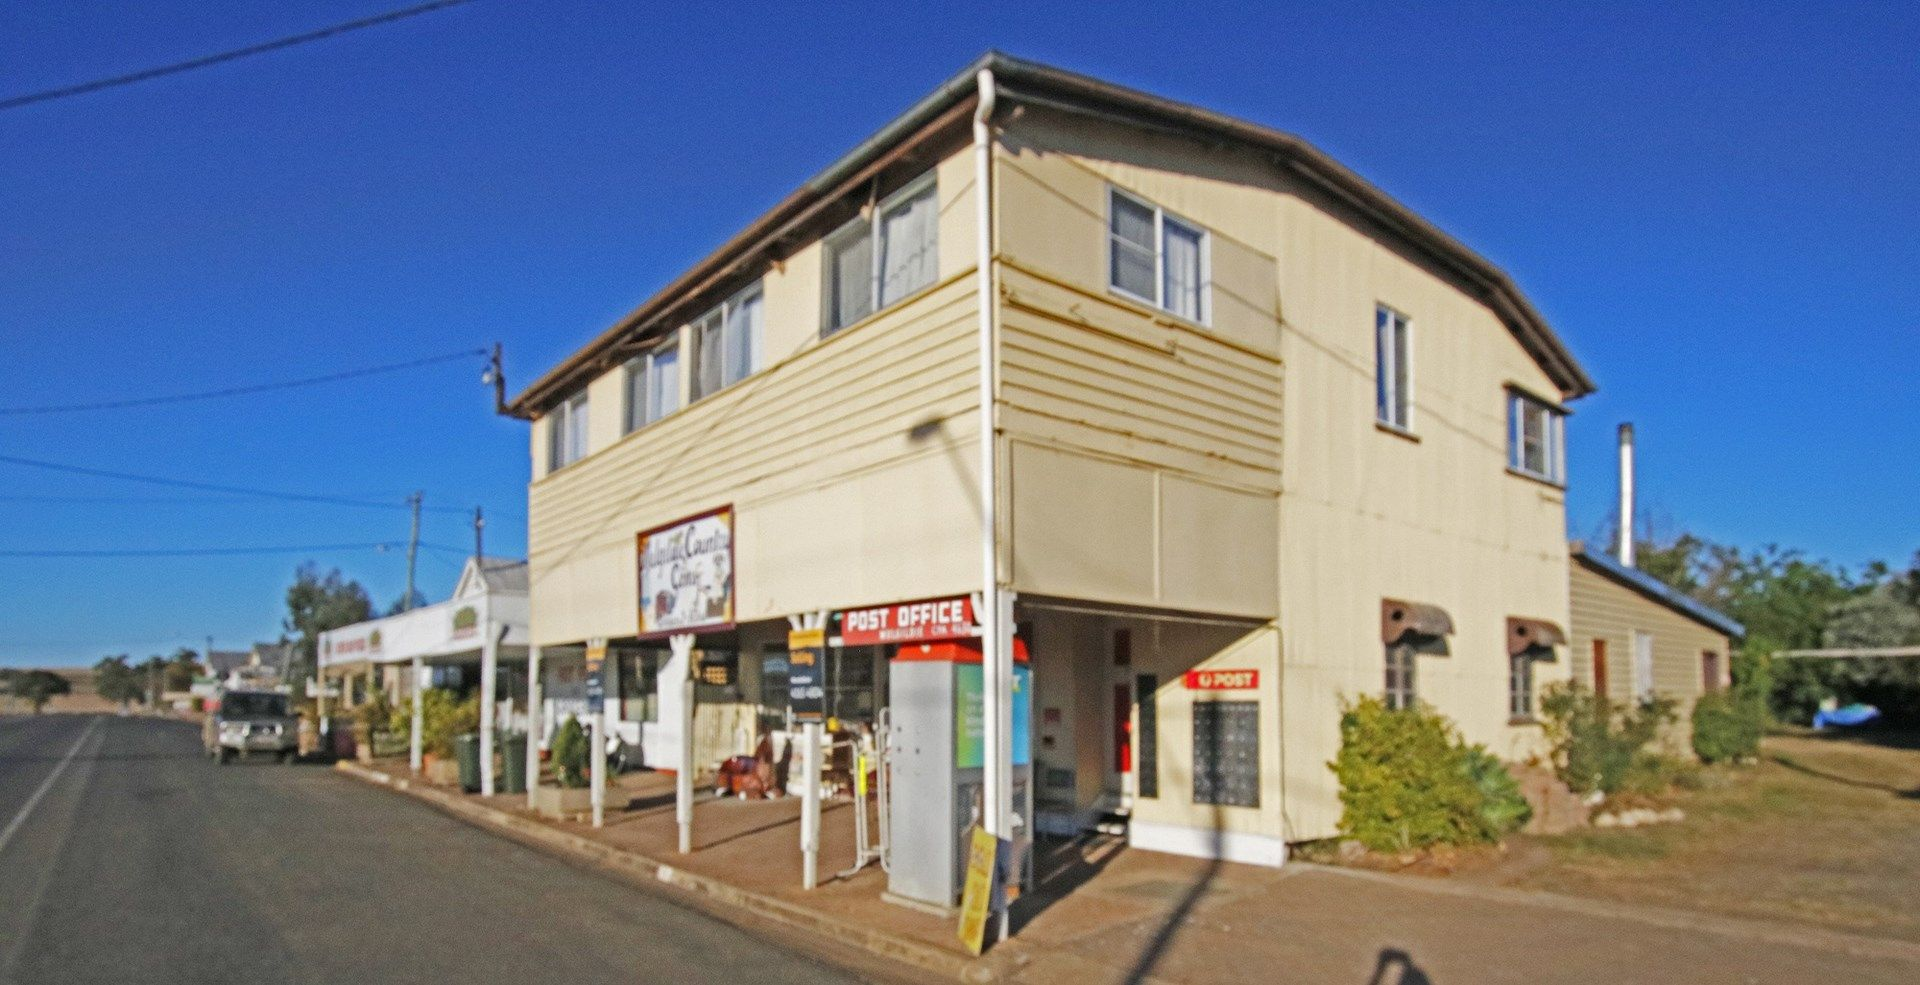 28 MONAL STREET, Mulgildie QLD 4630, Image 0